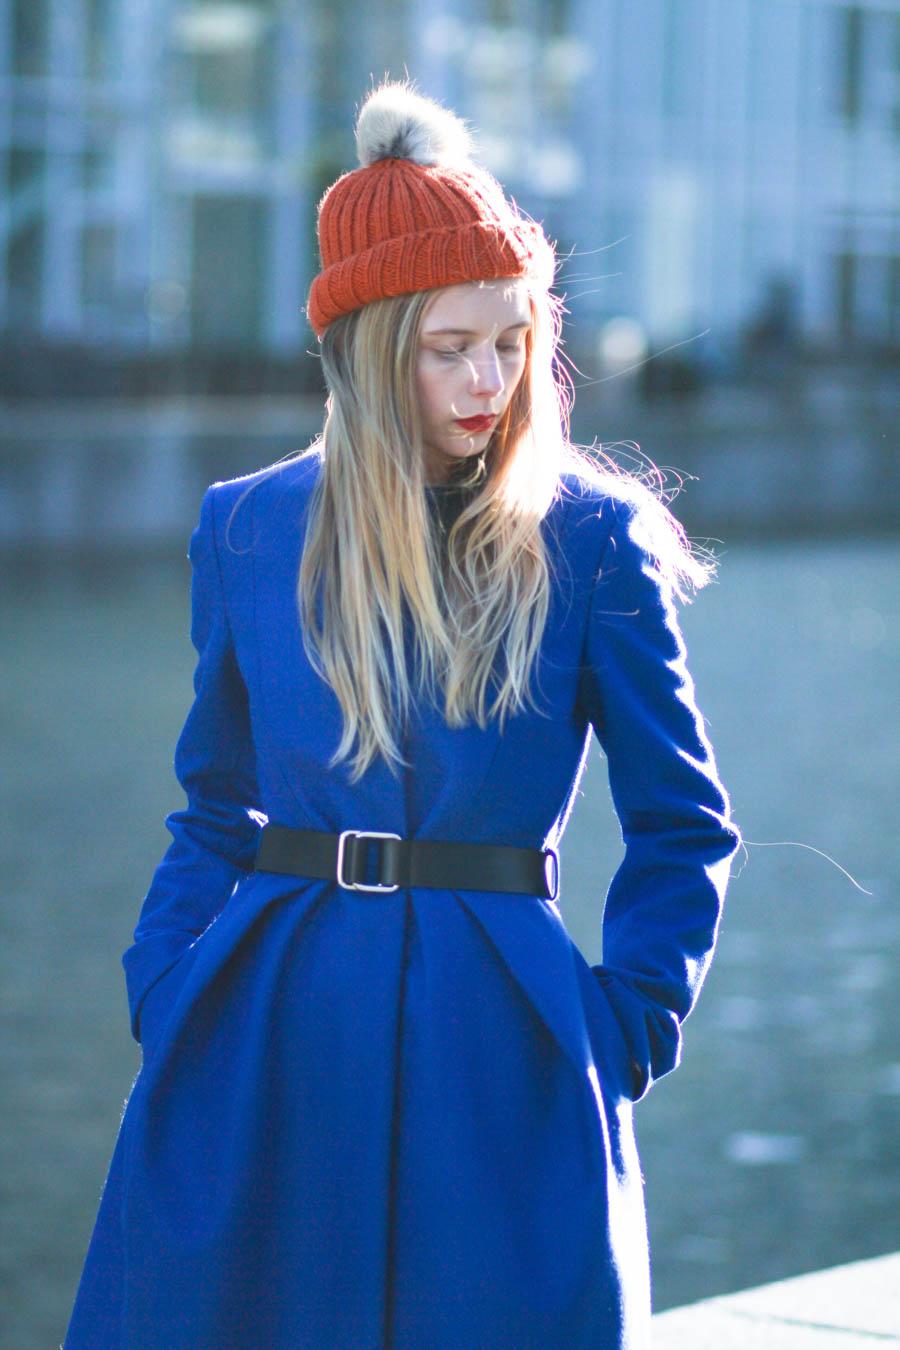 outfit December nemesis babe marie jensen danish blogger -7-2